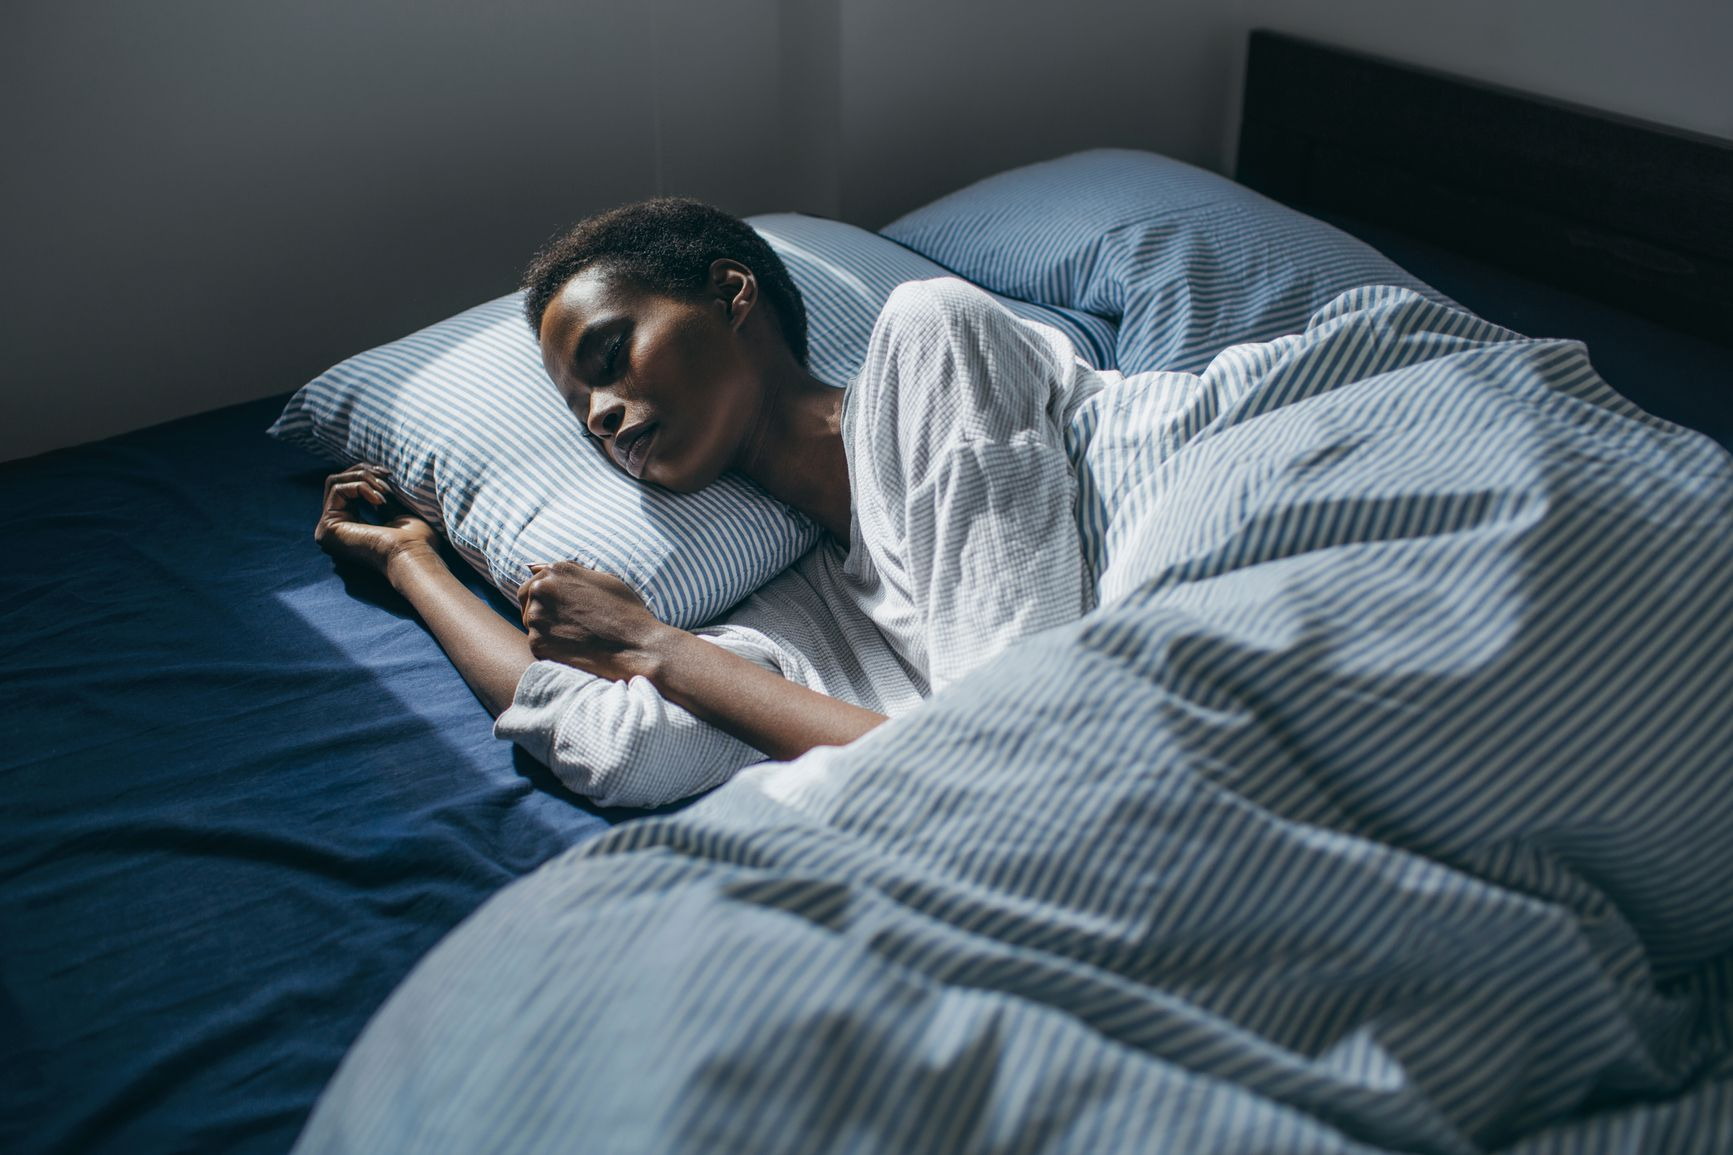 Marijuana as a Sleep Aid for Insomnia and Nightmares